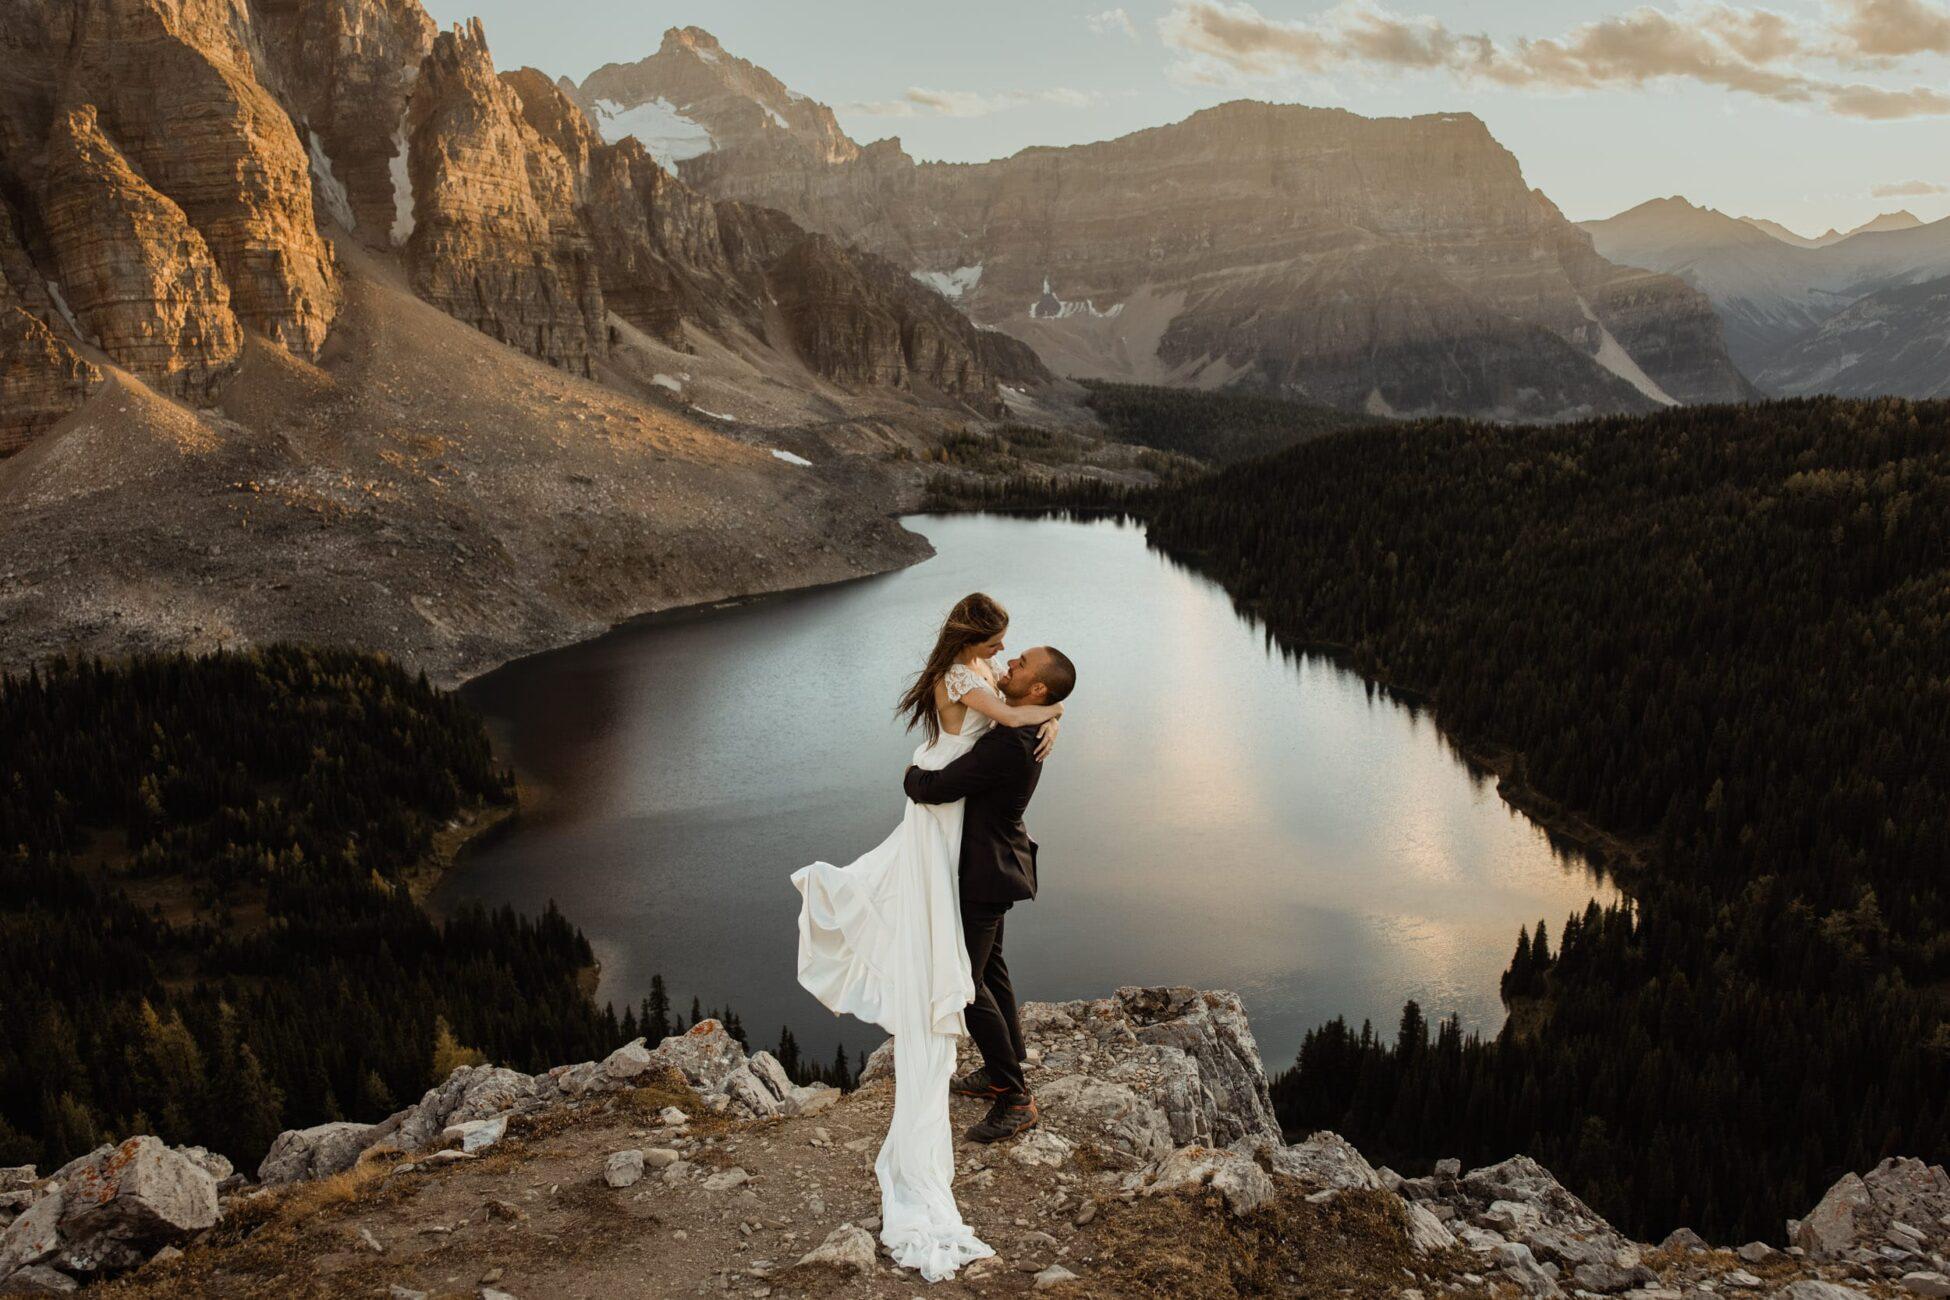 Mount Assiniboine Post-Wedding Session